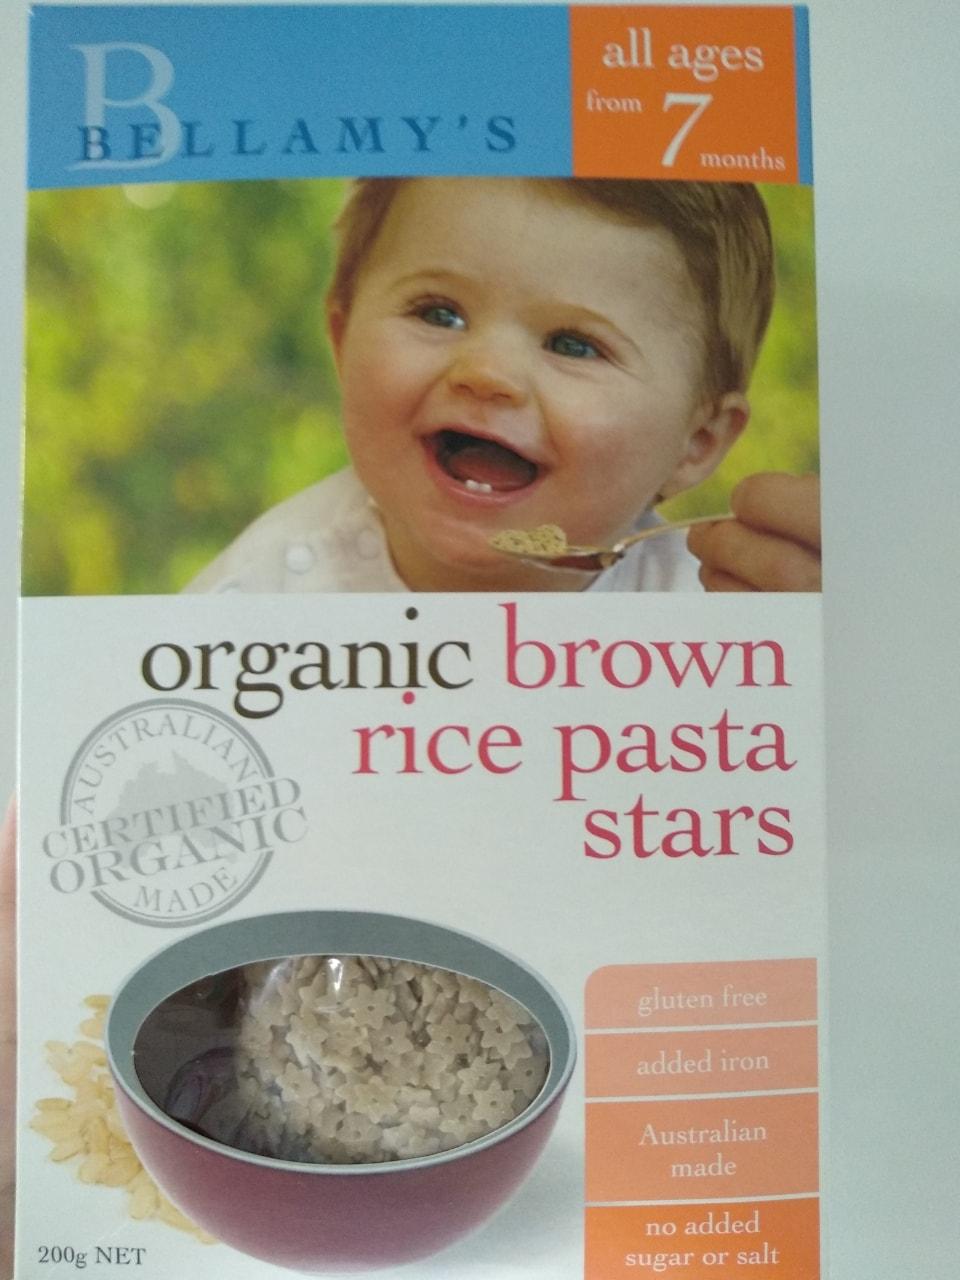 Bellamy's organic brown rice pasta stars